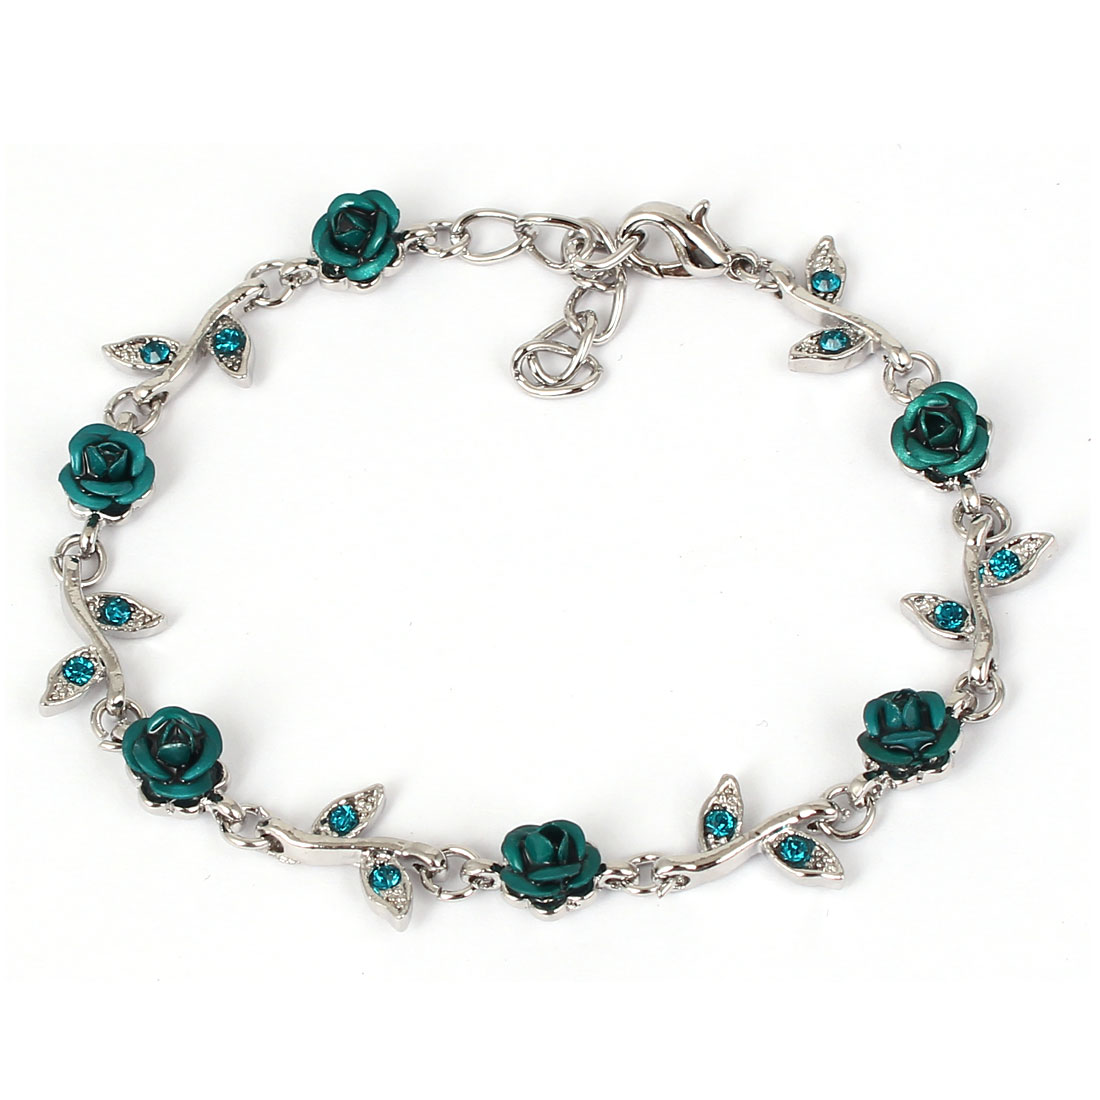 Lady Fashion Jewelry Rose Flower Crystal Decor Bracelet Silver Tone Teal Green